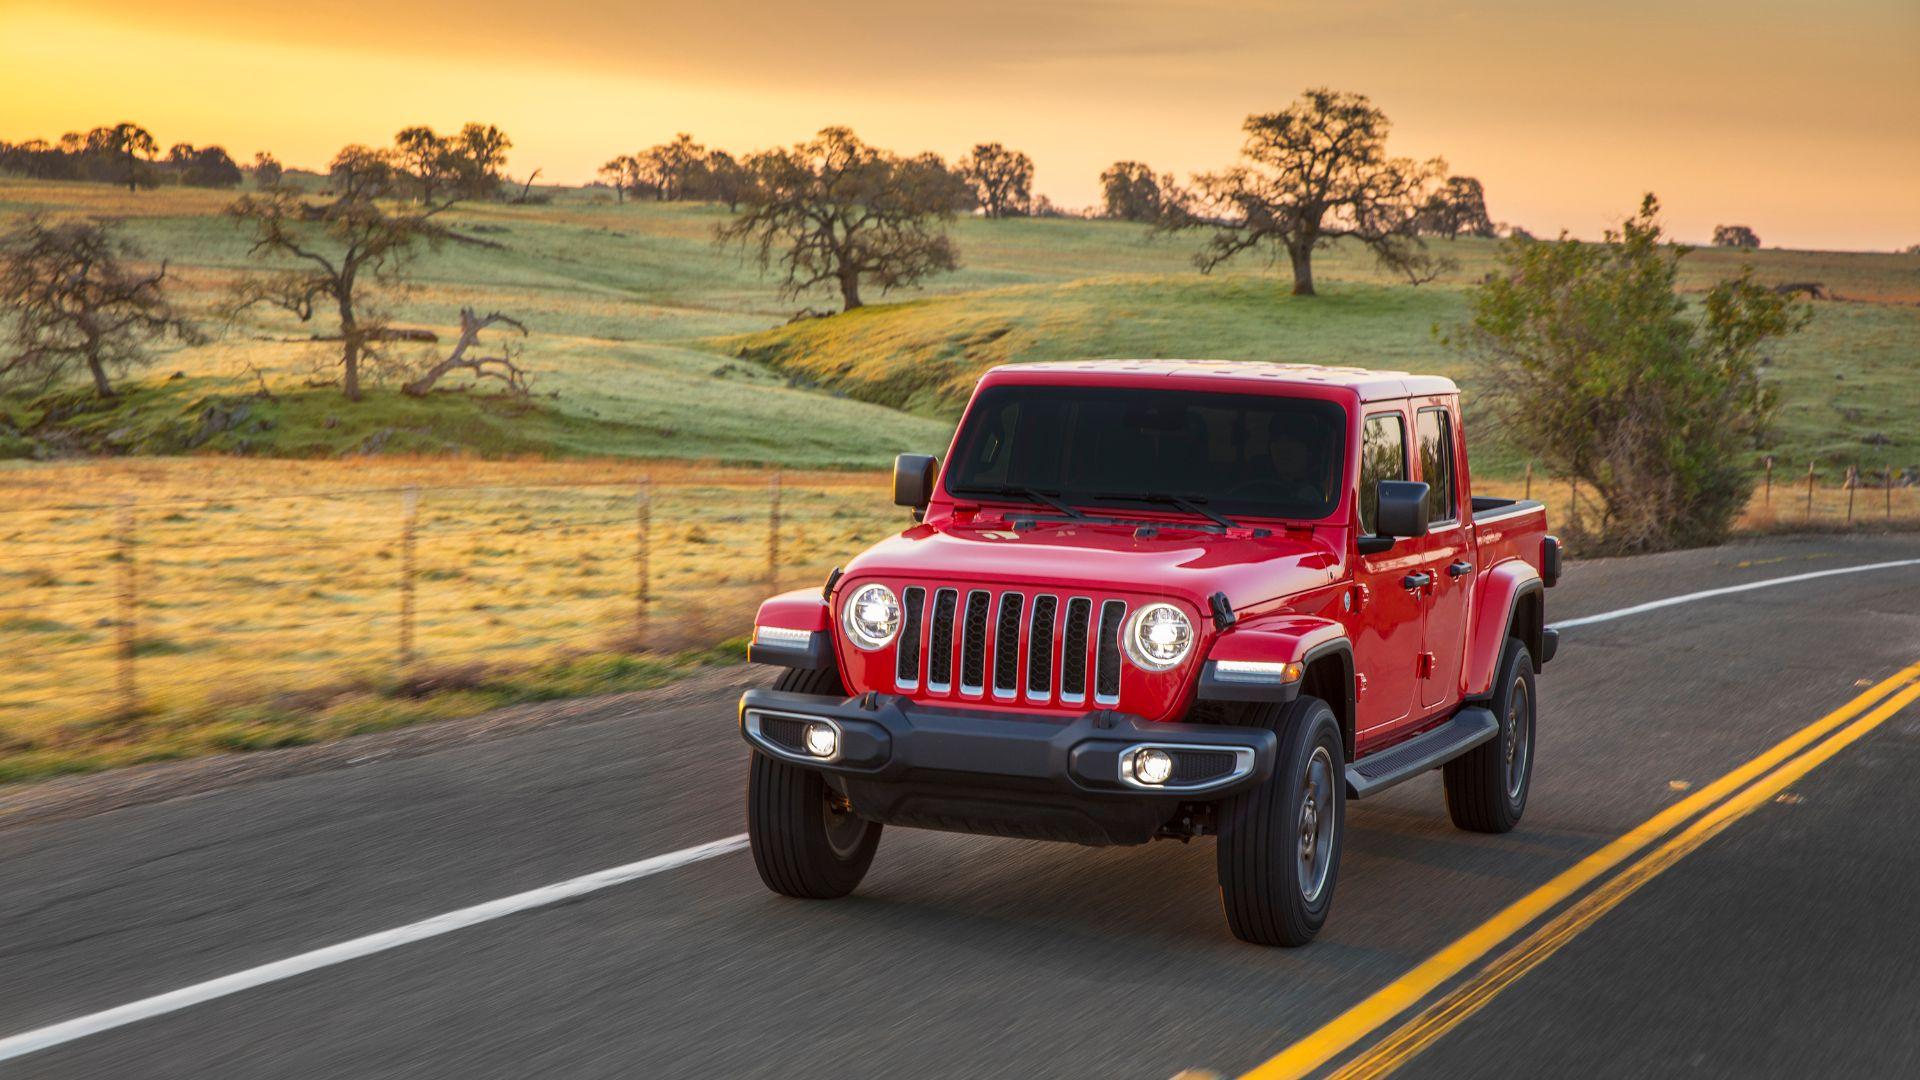 Jeep Gladiator army truck